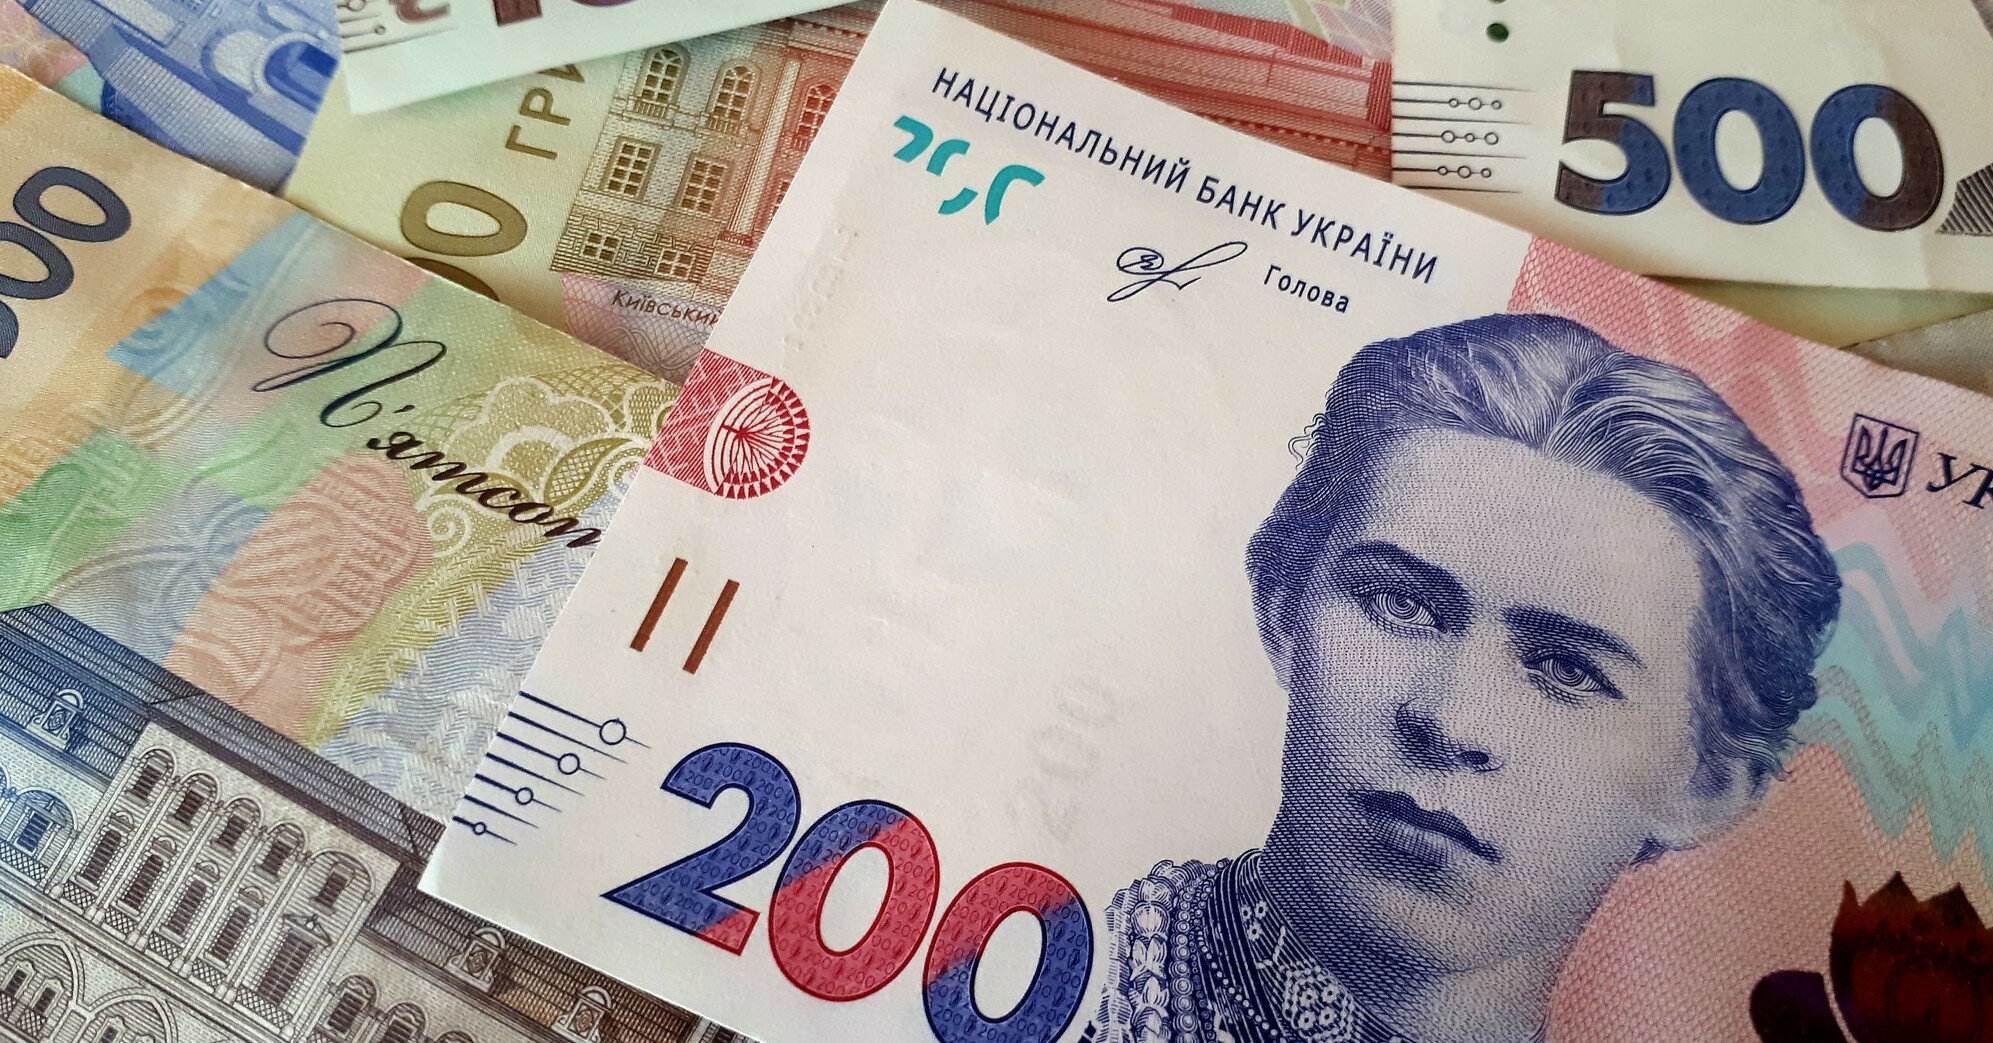 Україна недоотримала 2,8 млрд грн за оренду держмайна